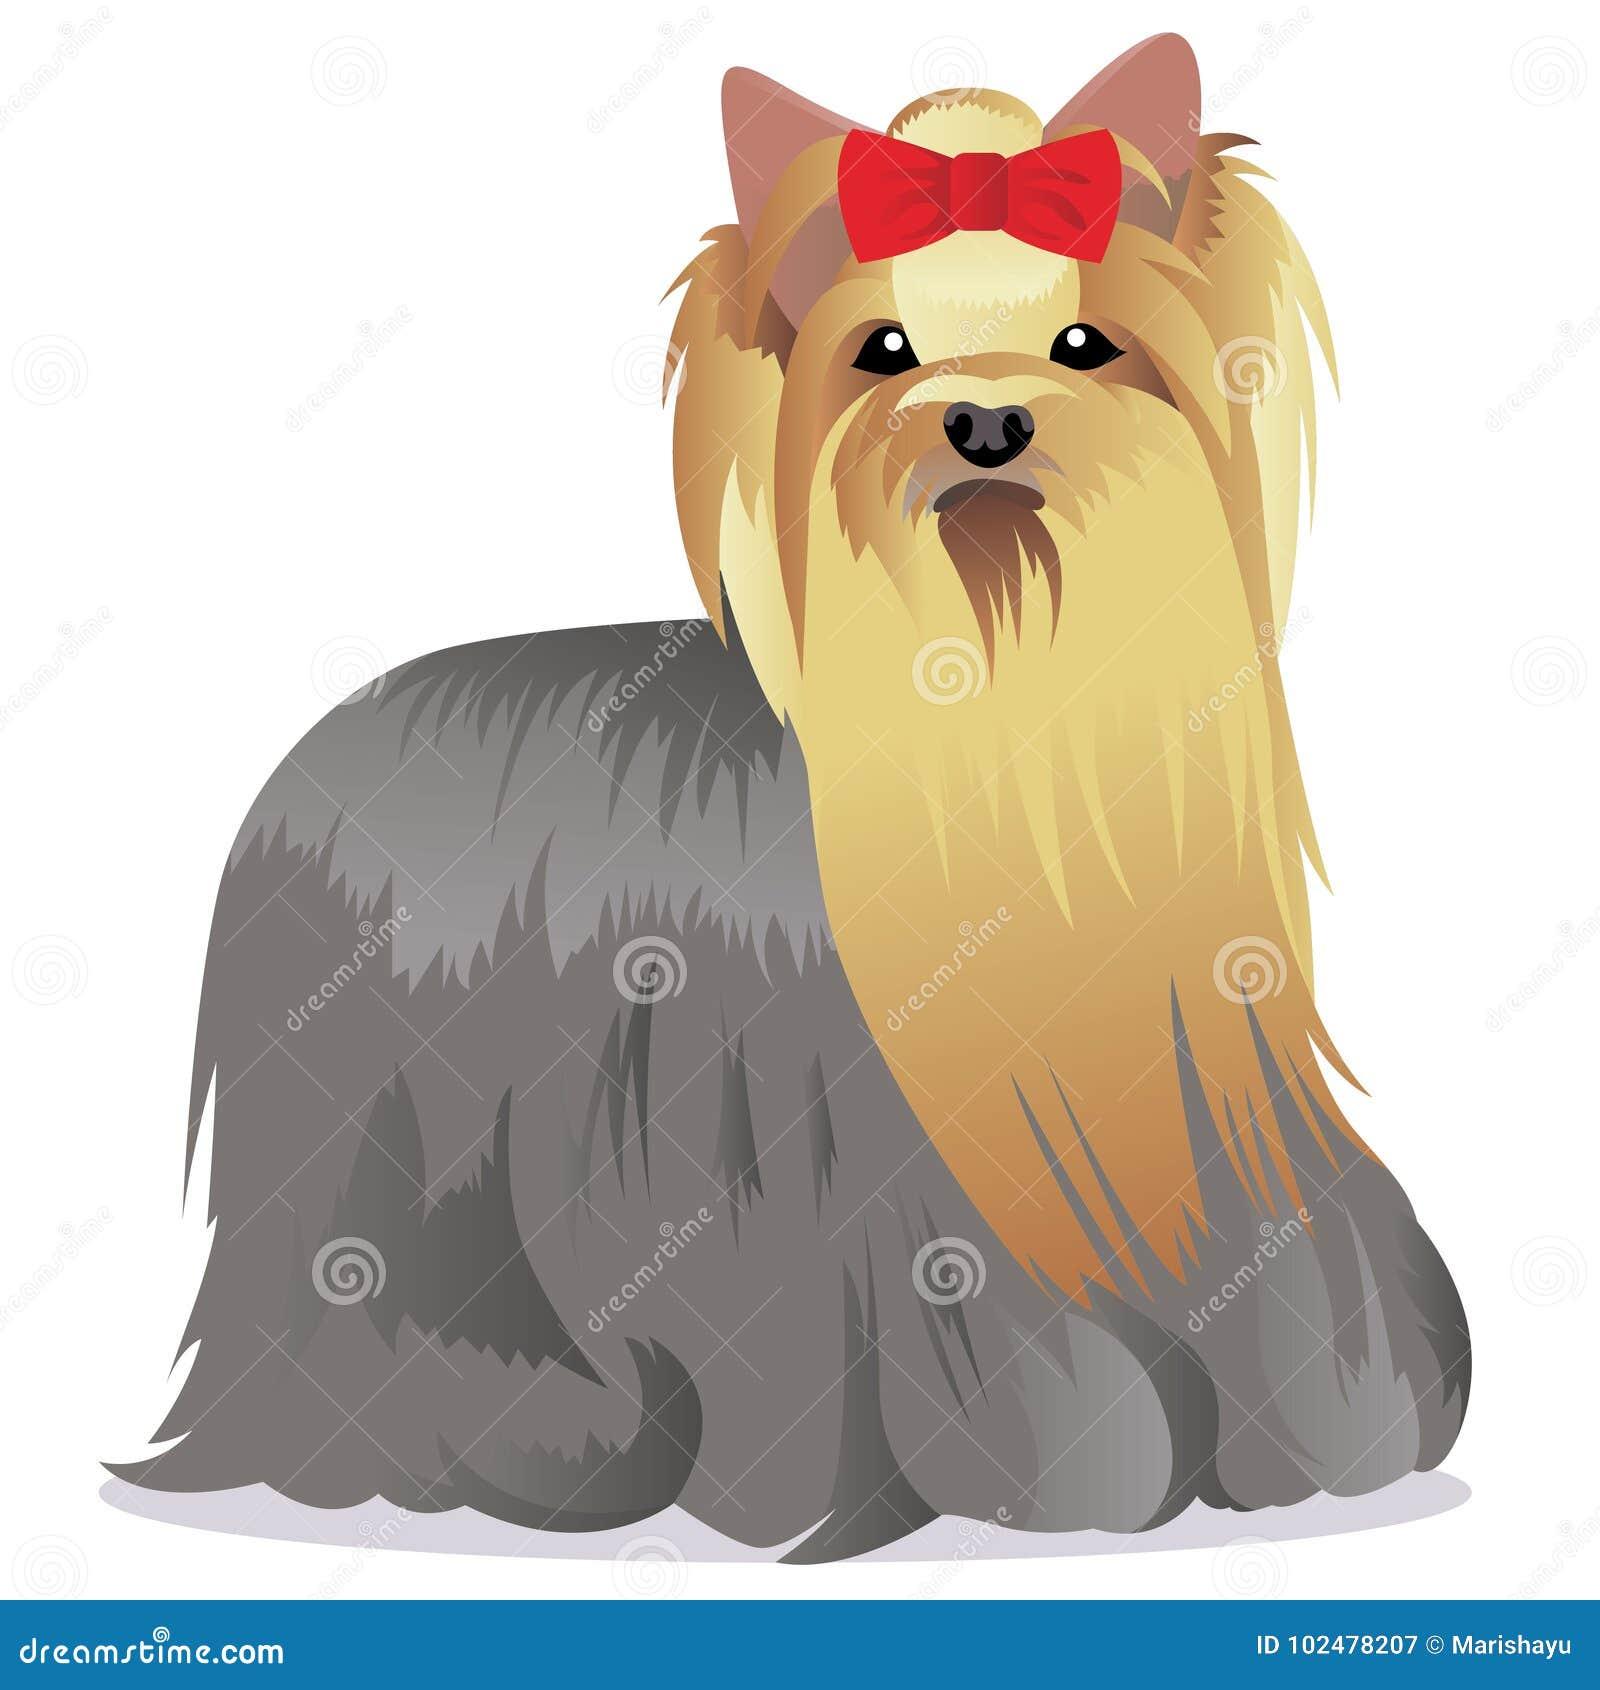 Yorkshire Terrier Dog Stock Vector Illustration Of Illustration